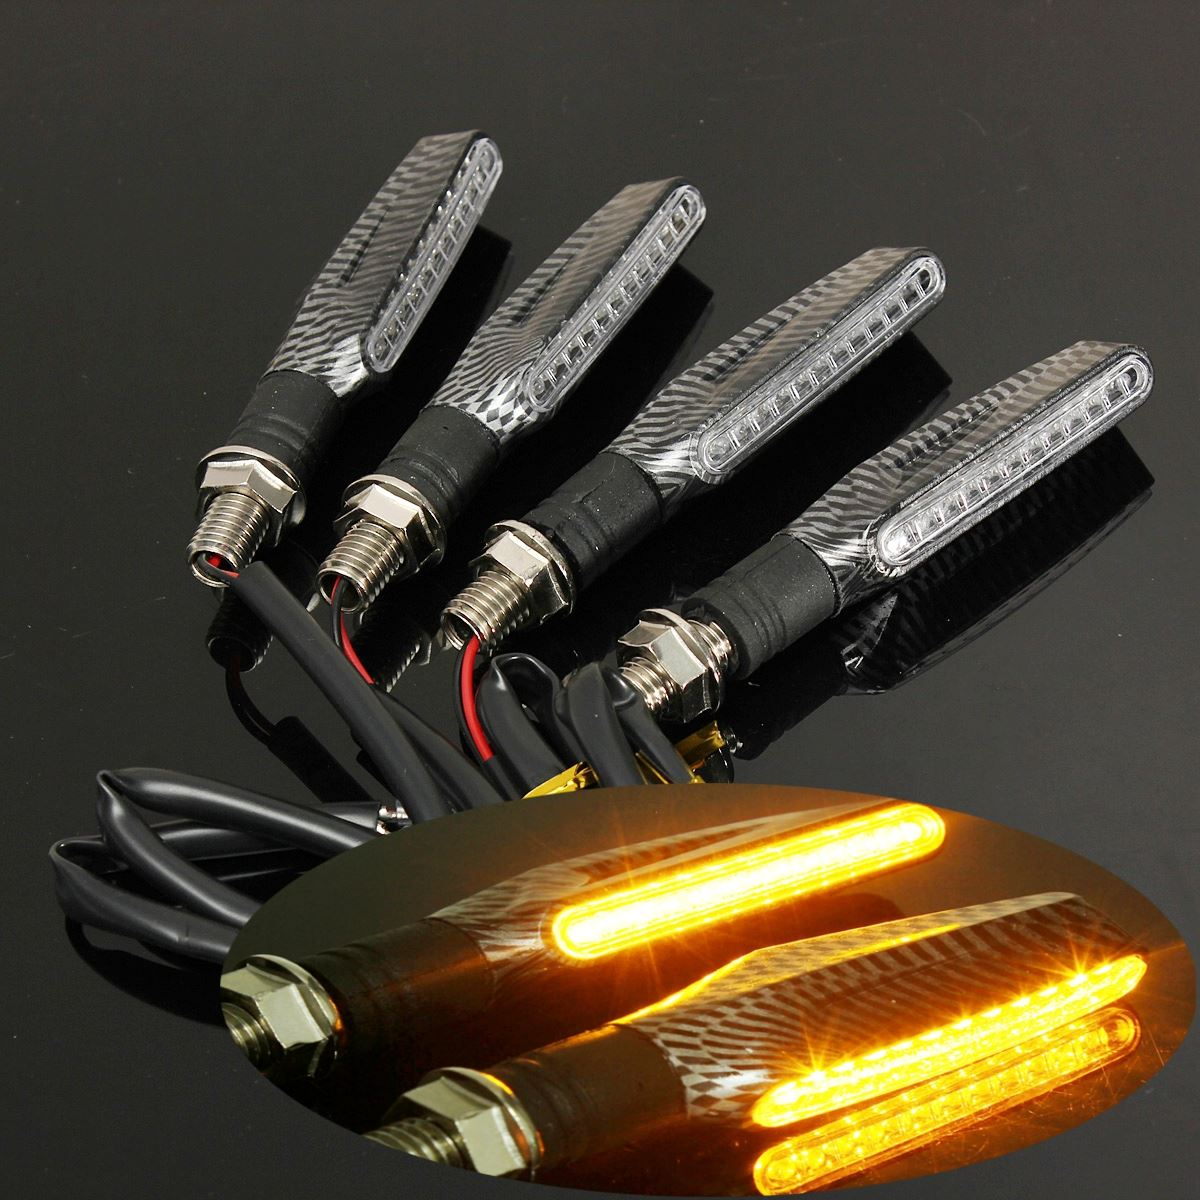 4X Motorcycle LED Turn Signal Indicator Light Honda CBR 600 F4i 1000 RR 900 12V